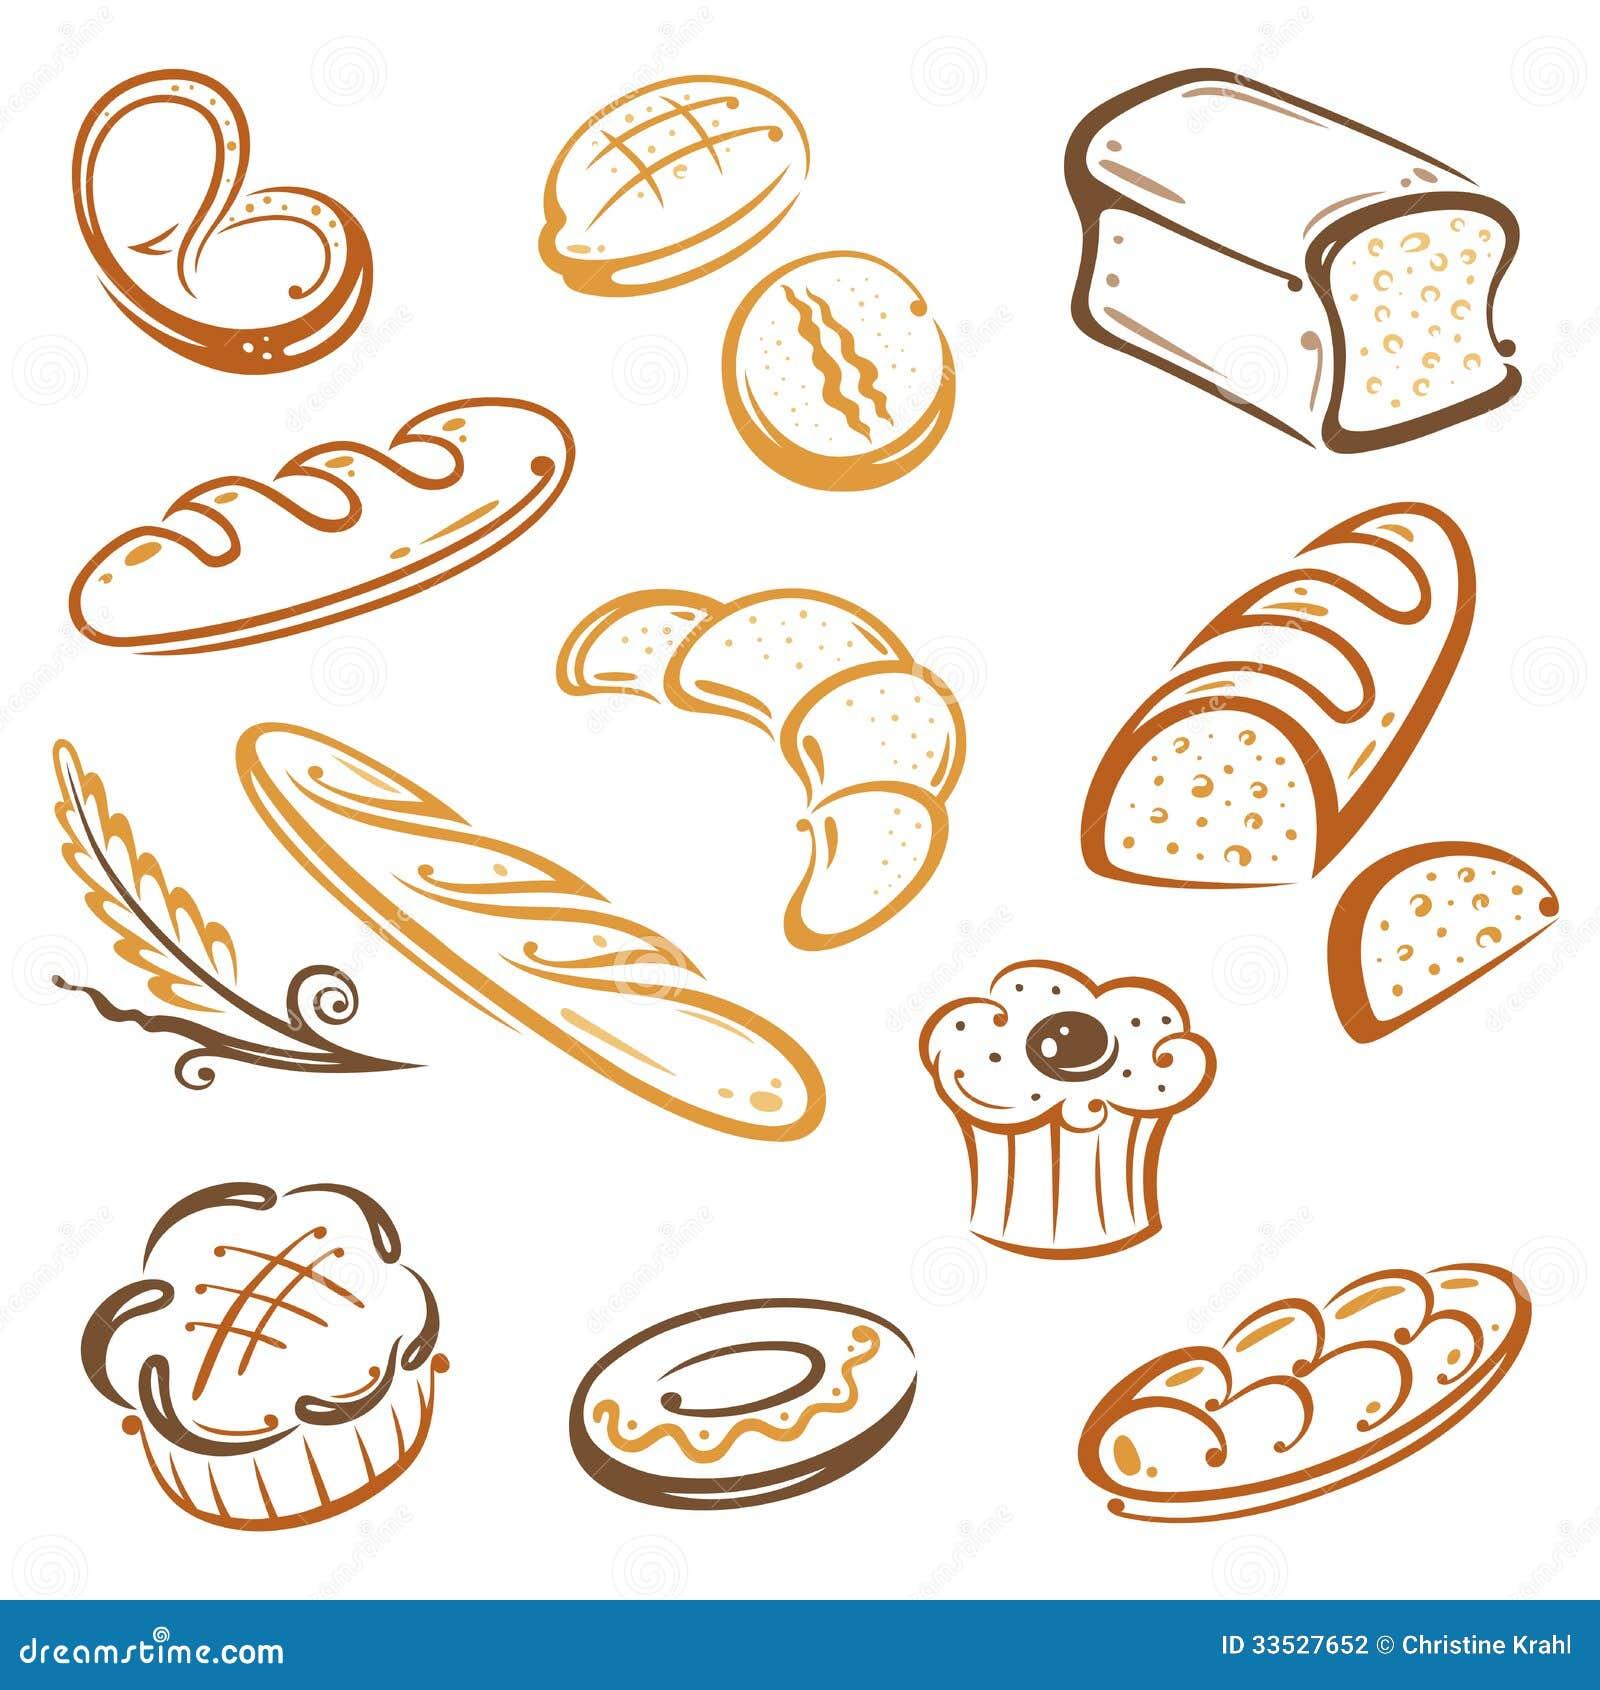 Bread, Bakery Stock Photography - Image: 33527652